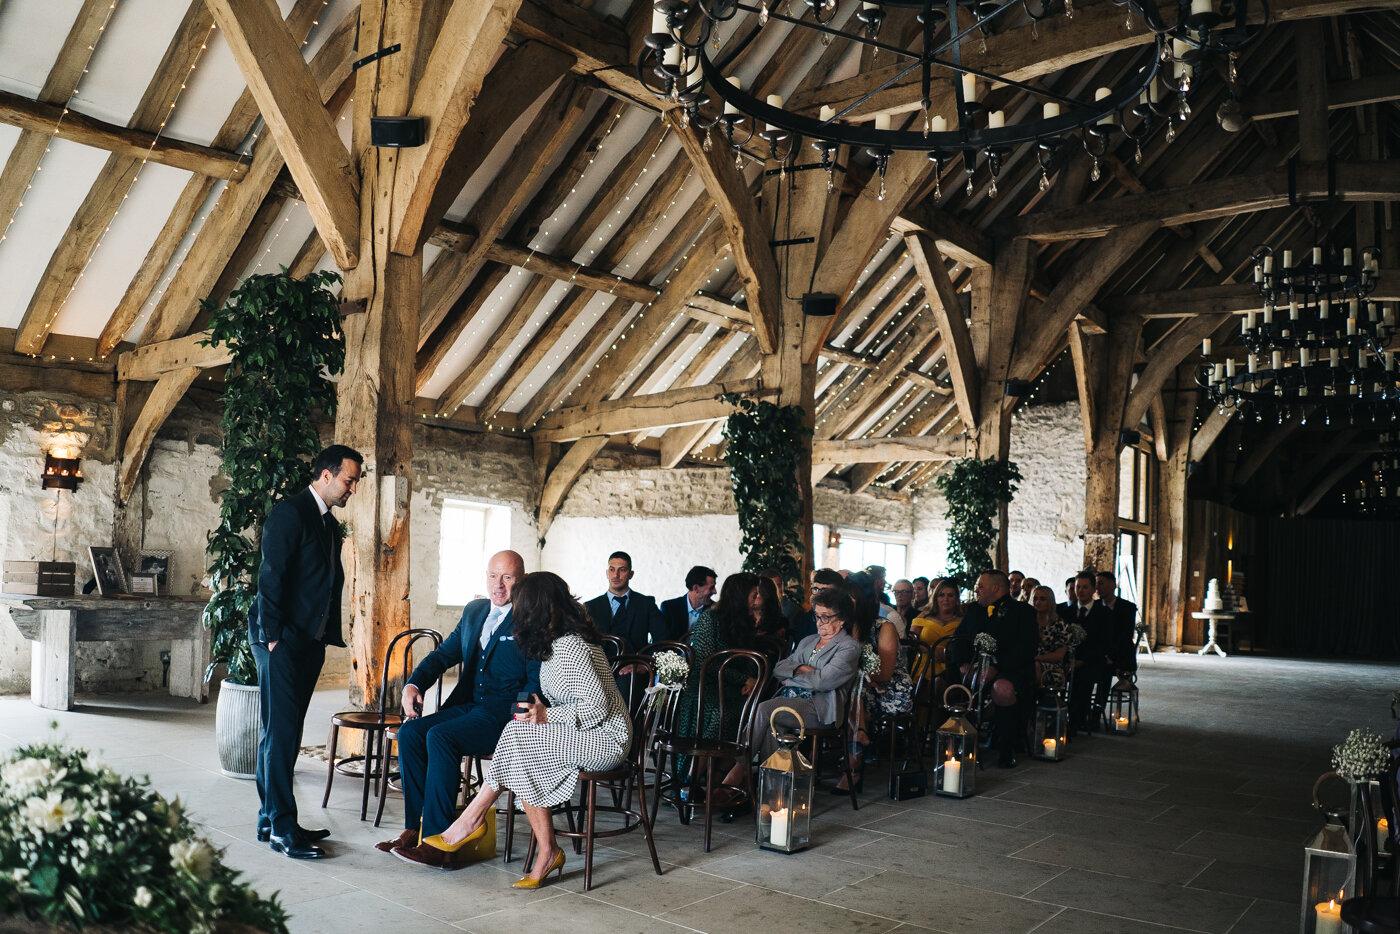 tithe-barn-bolton-abbey-north-yorkshire-cripps-wedding-photographer-creative-0018.jpg